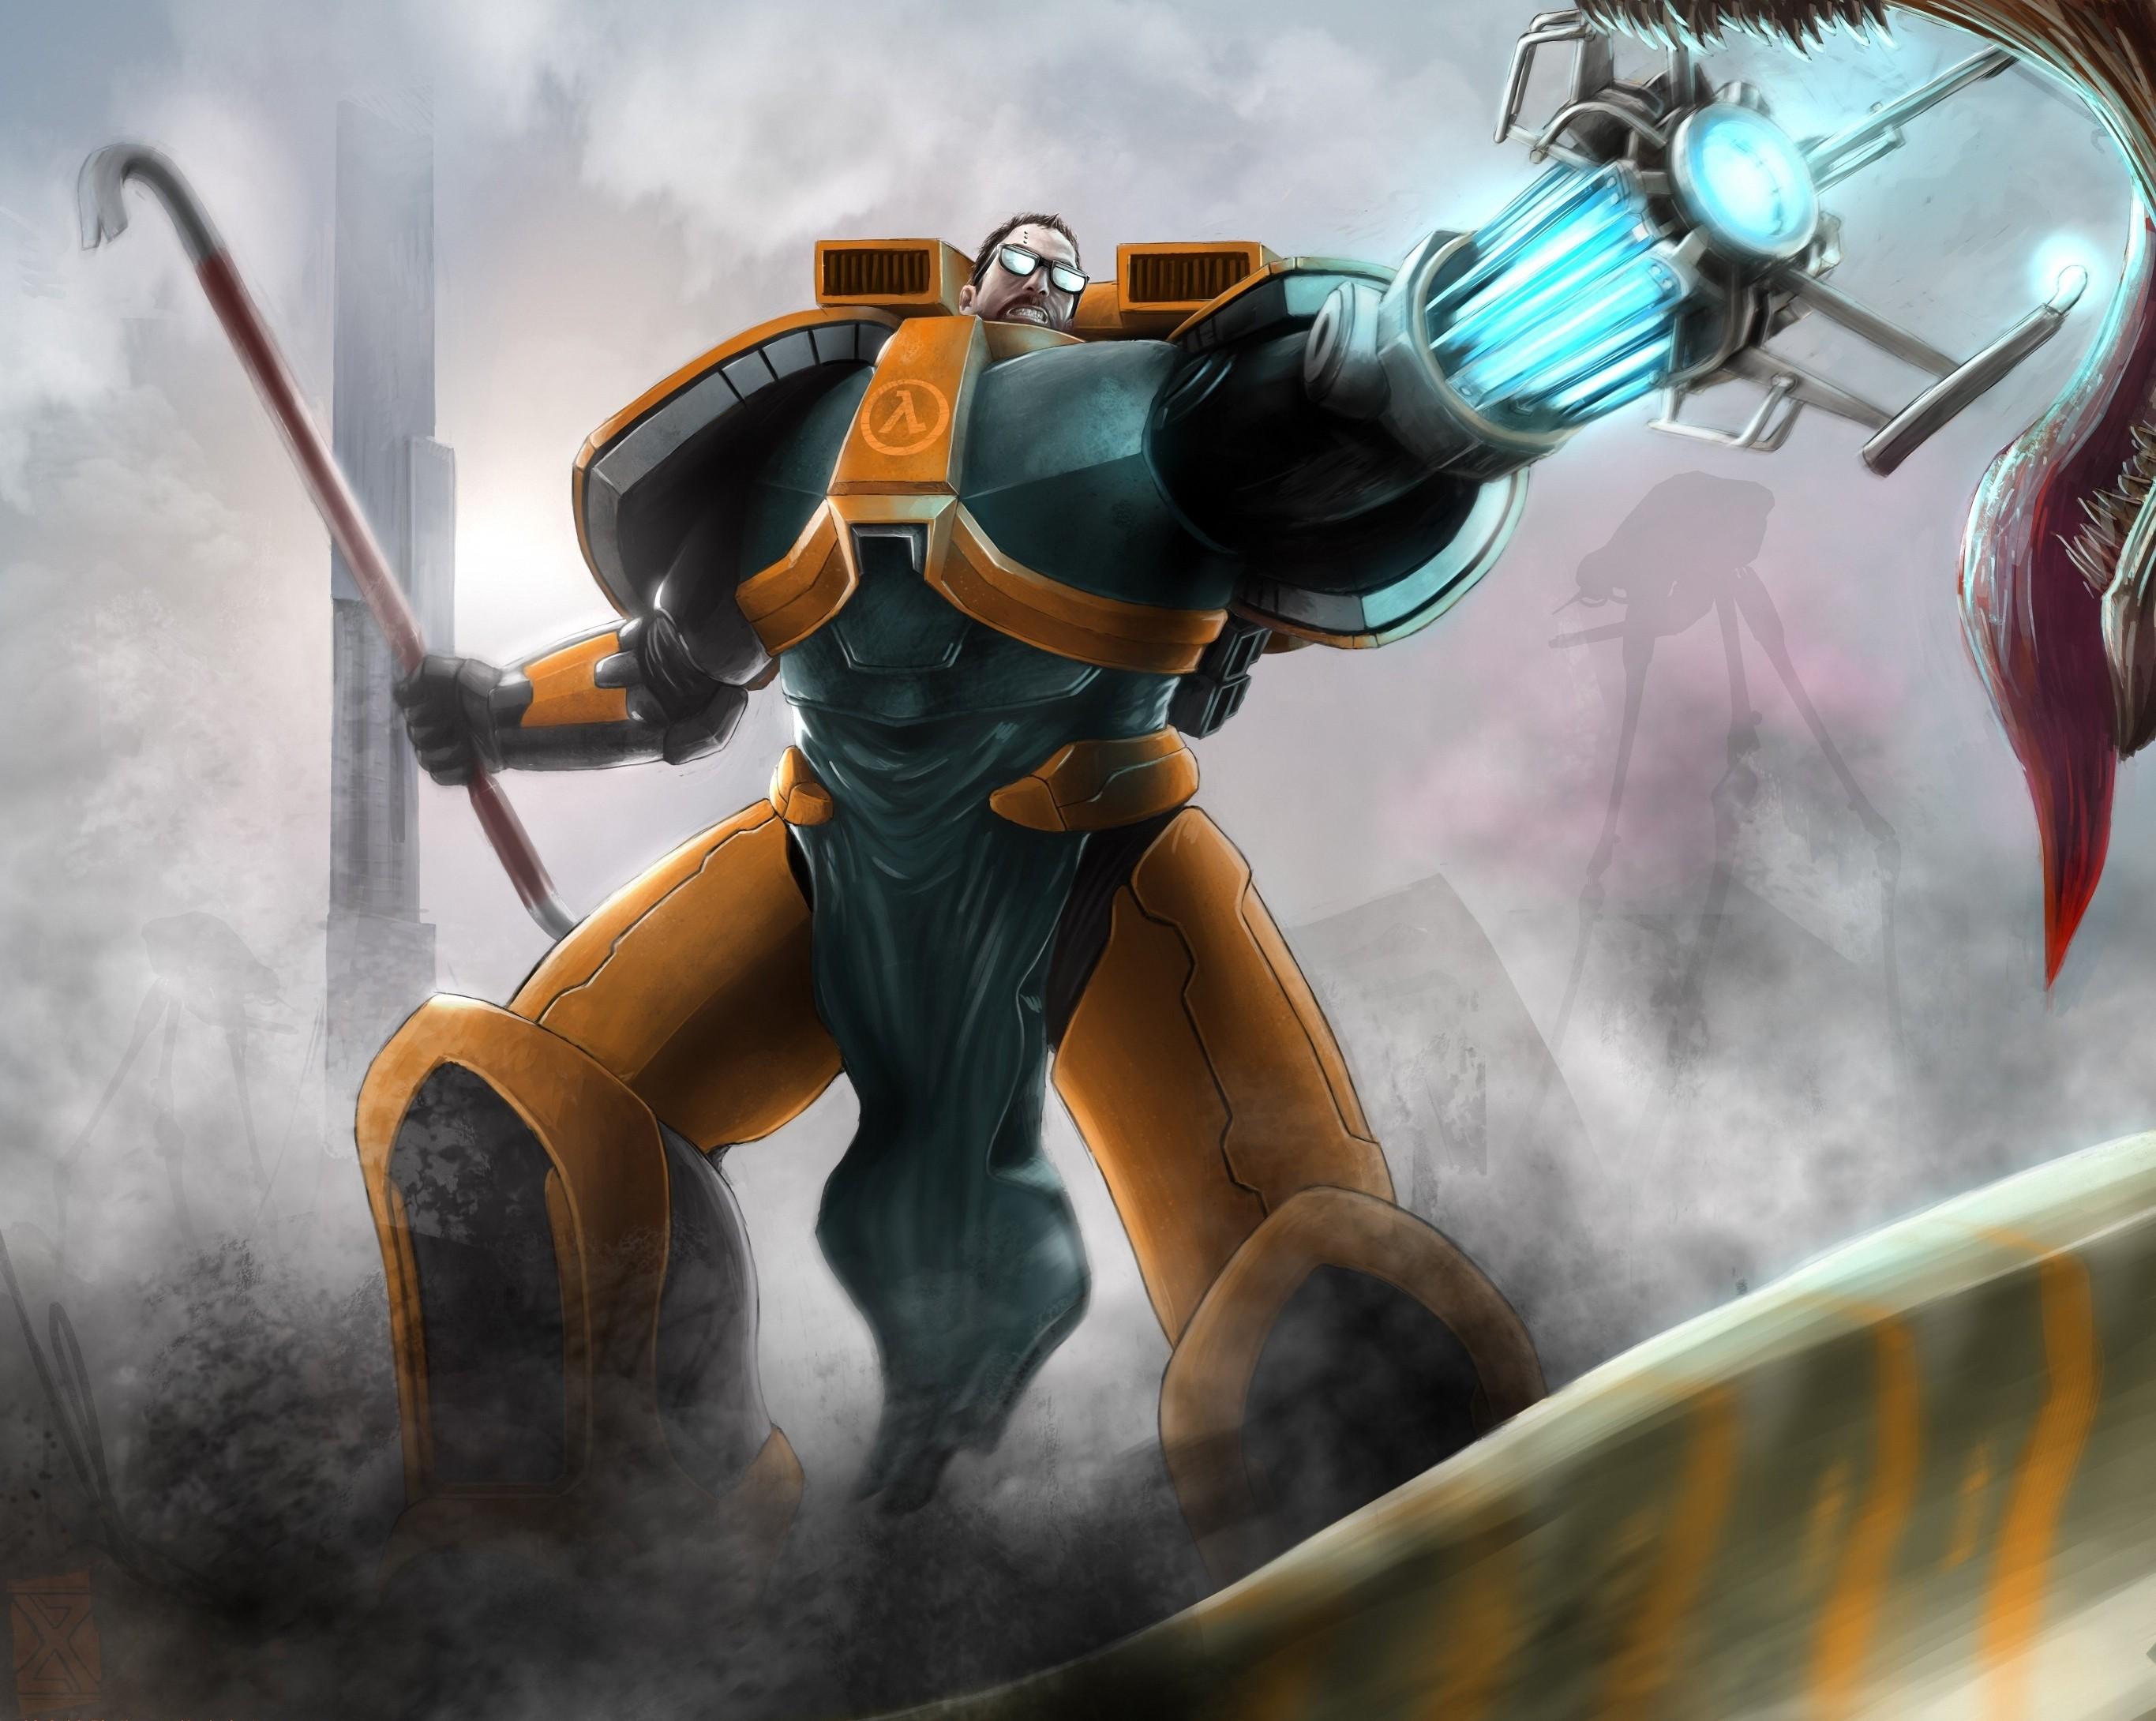 Wallpaper Video Games Anime Artwork Machine Half Life 2